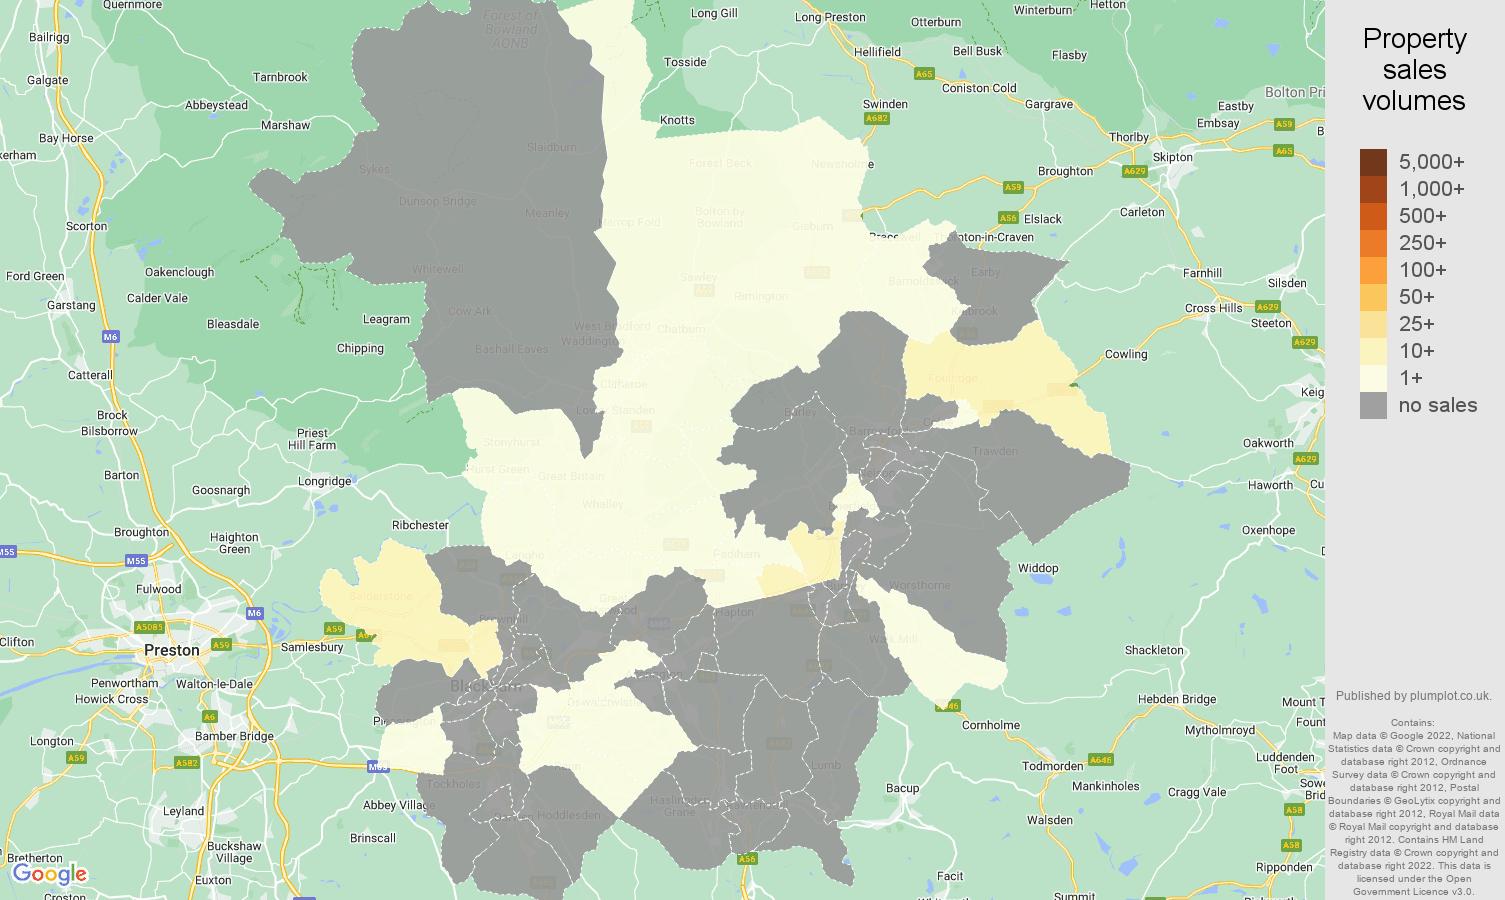 Blackburn map of sales of new properties